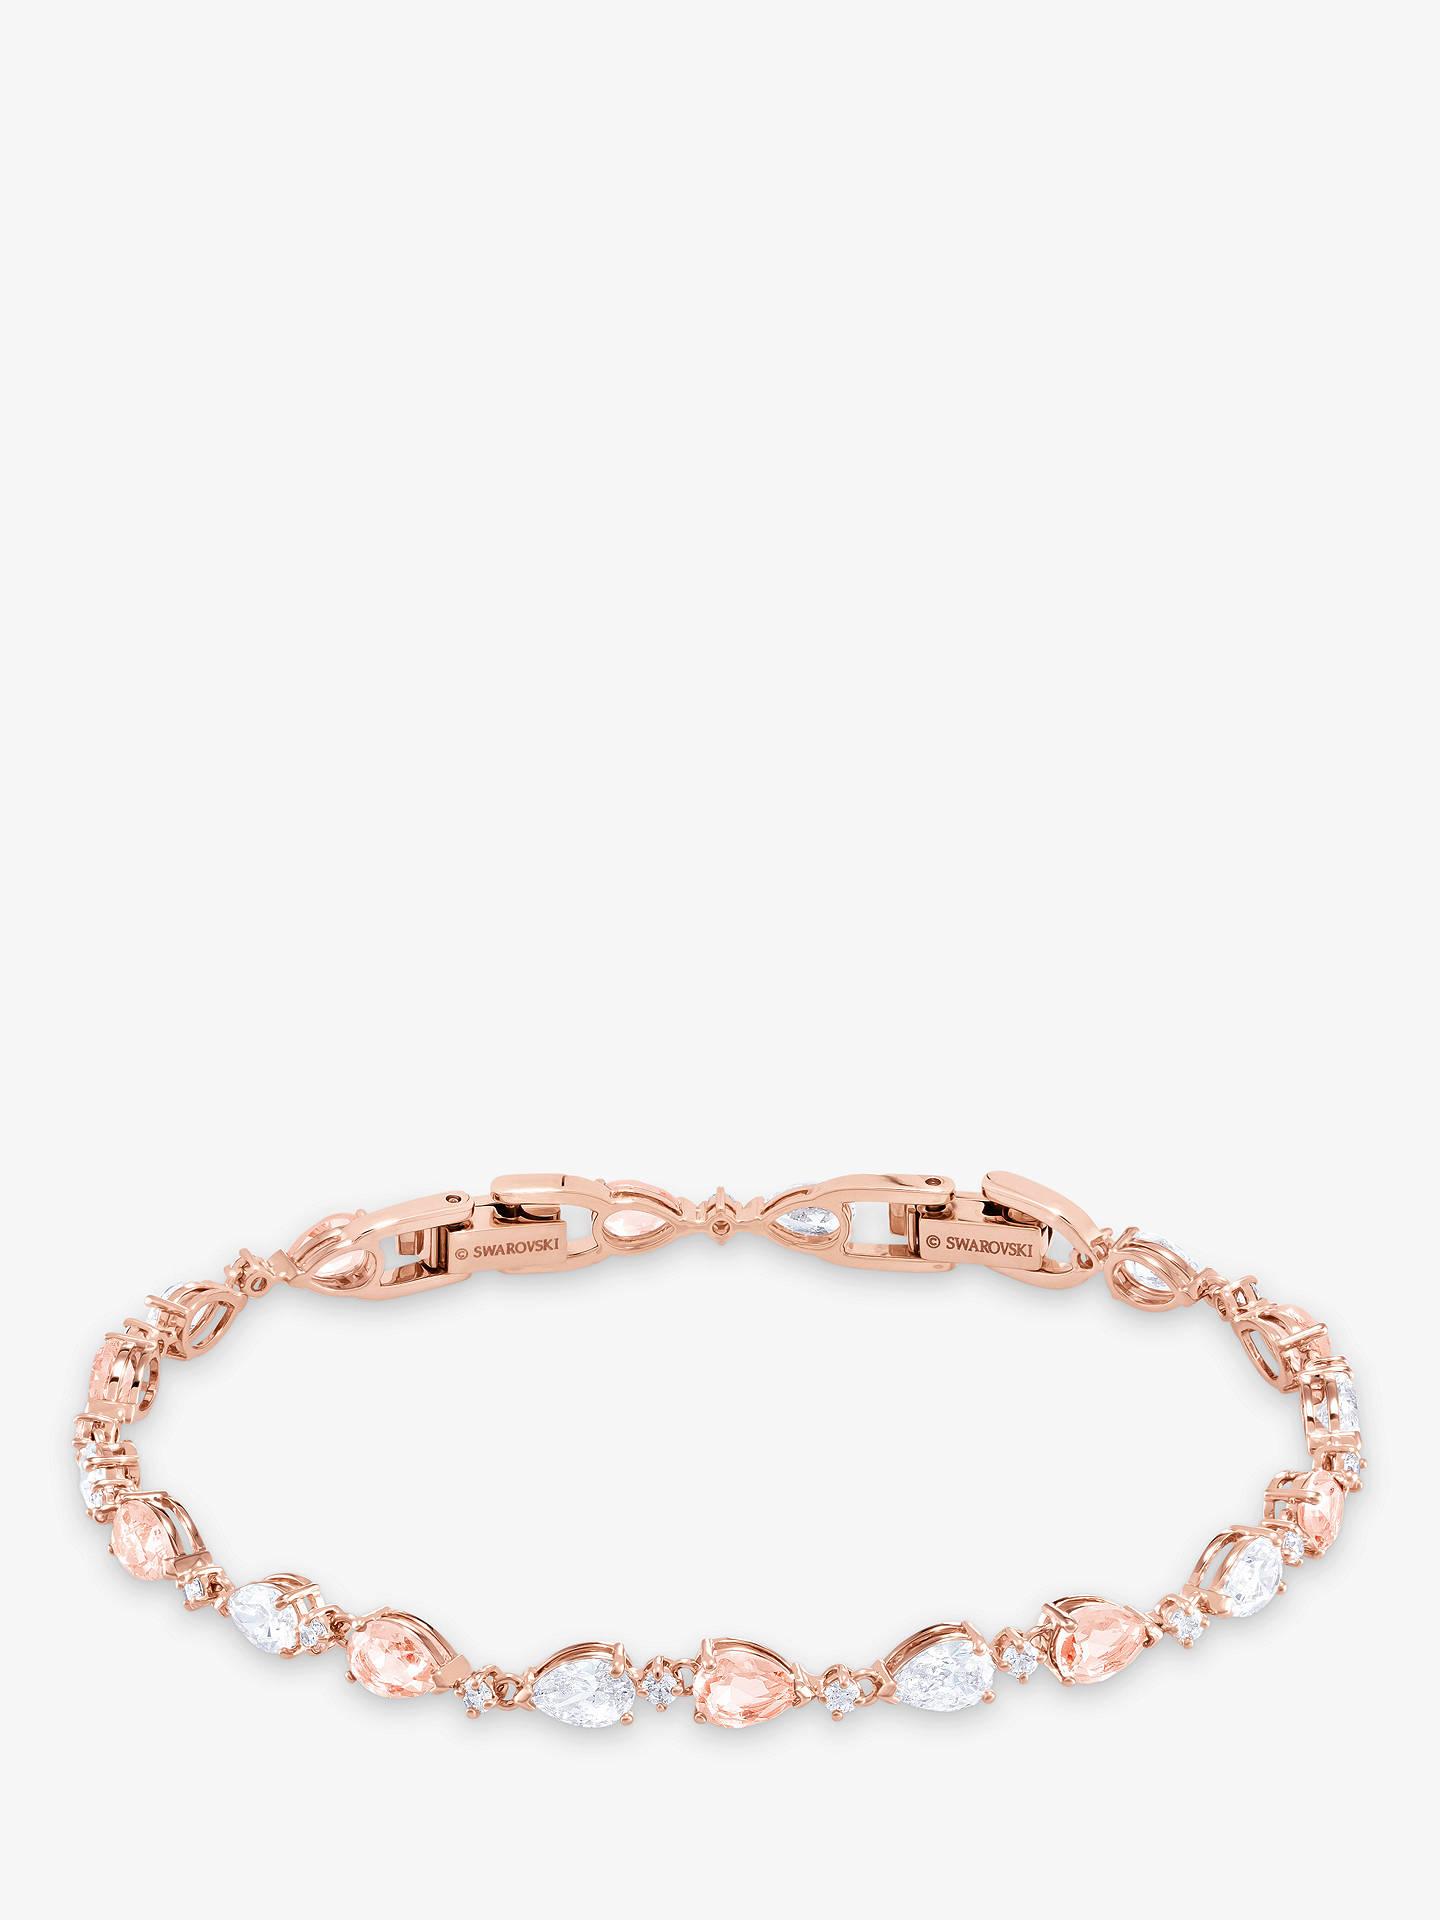 BuySwarovski Vintage Crystal Teardrop Bracelet 19edc4f149f3